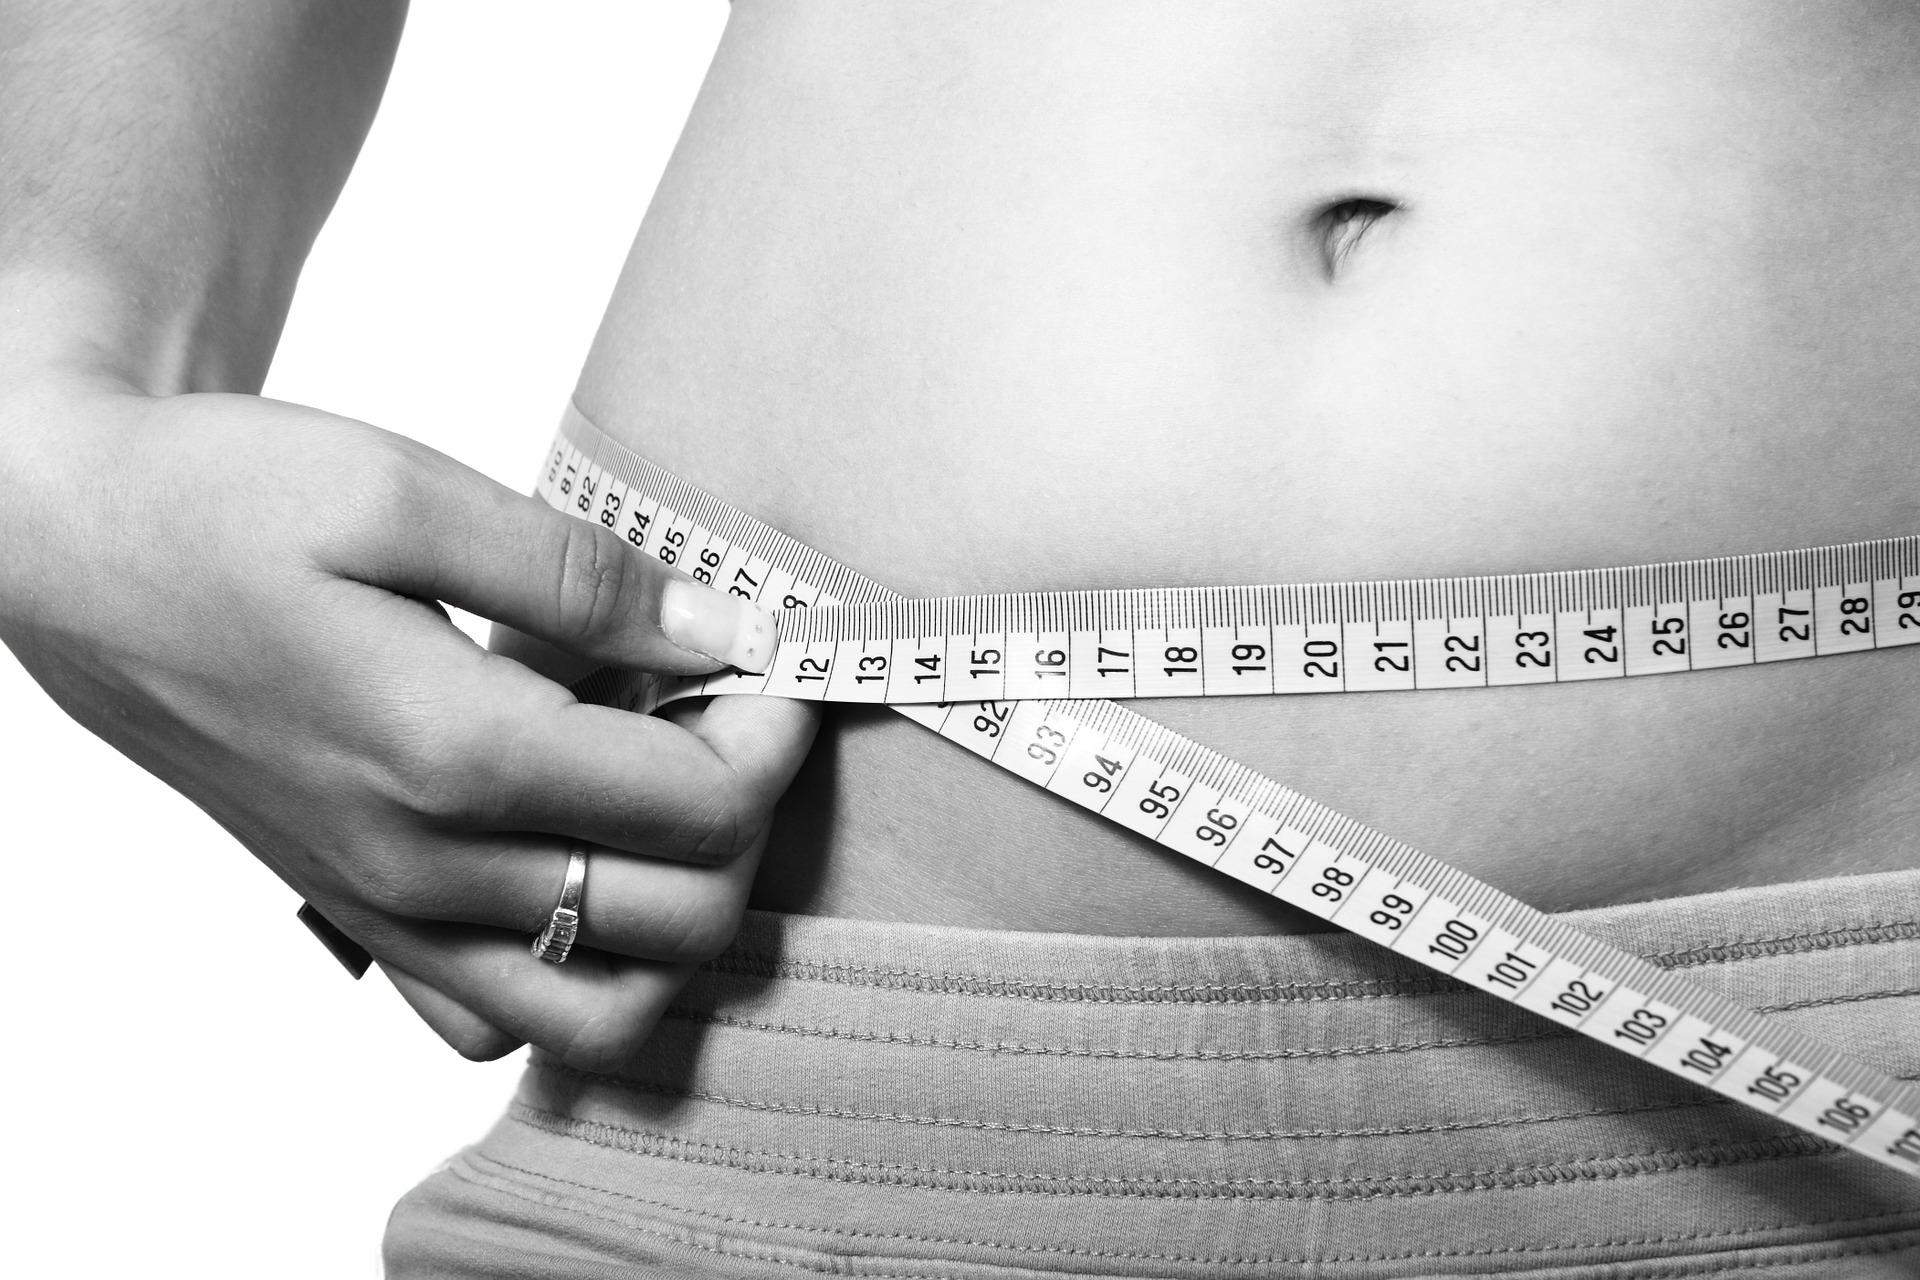 Methoden zur Fettreduktion: Fettabsaugung vs. Coolsculpting